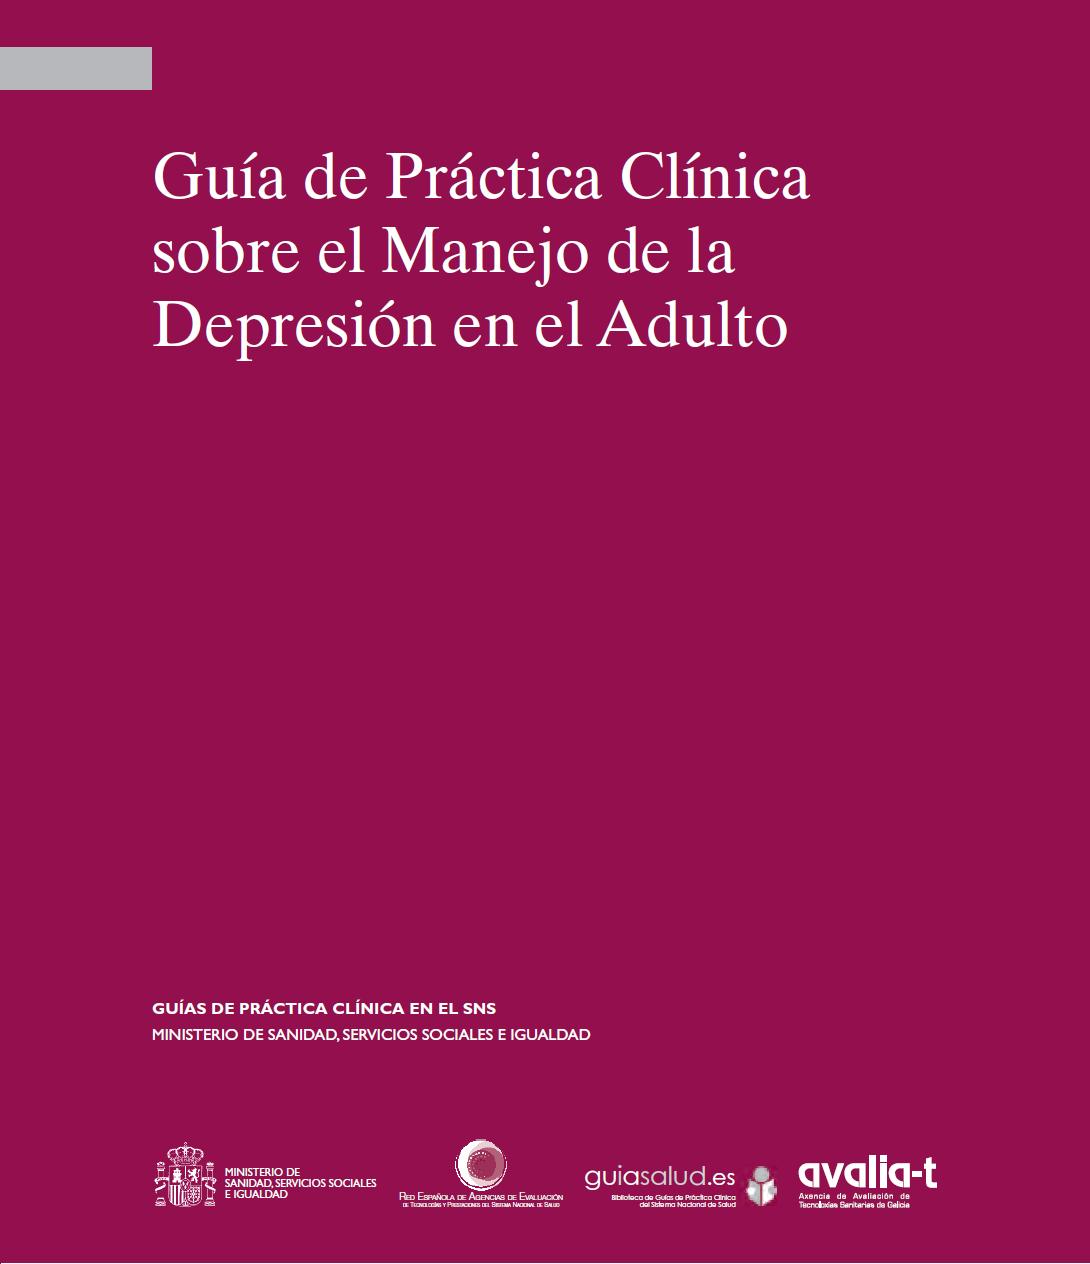 http://portal.guiasalud.es/GPC/GPC_534_Depresion_Adulto_Avaliat_compl.pdf